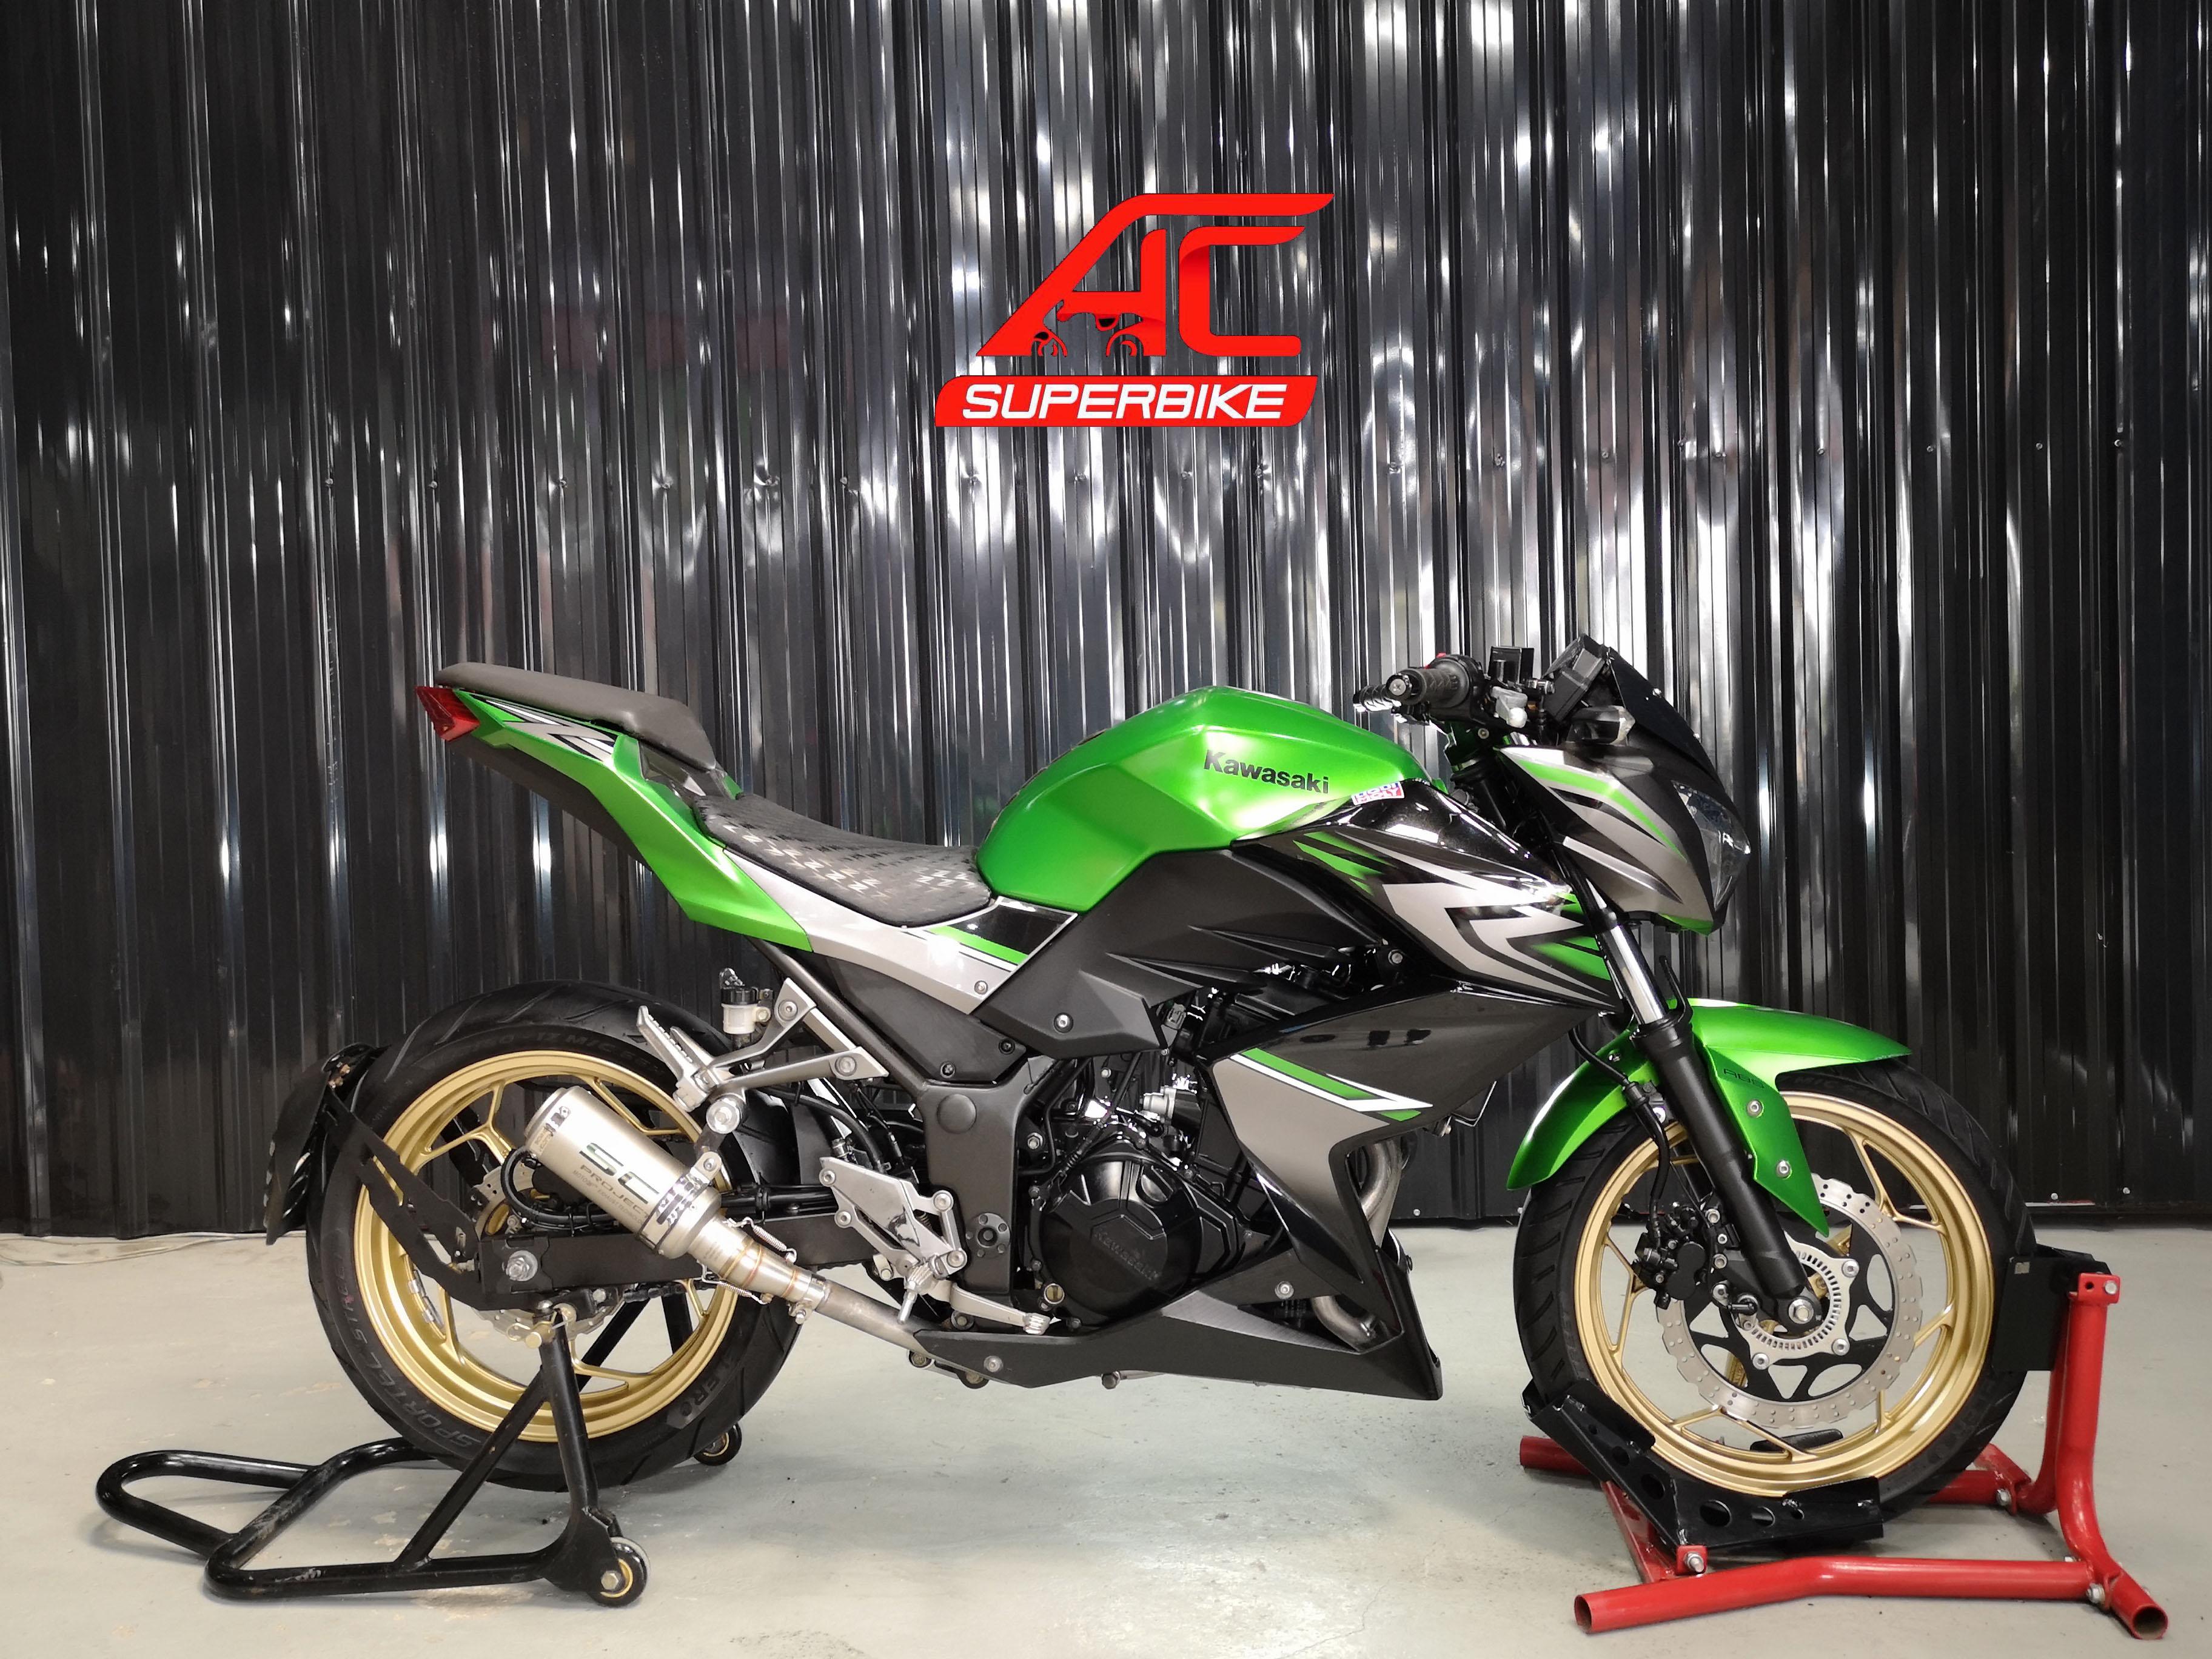 Z300 สีเขียว-ดำ ปี17 (ปิดการขาย)